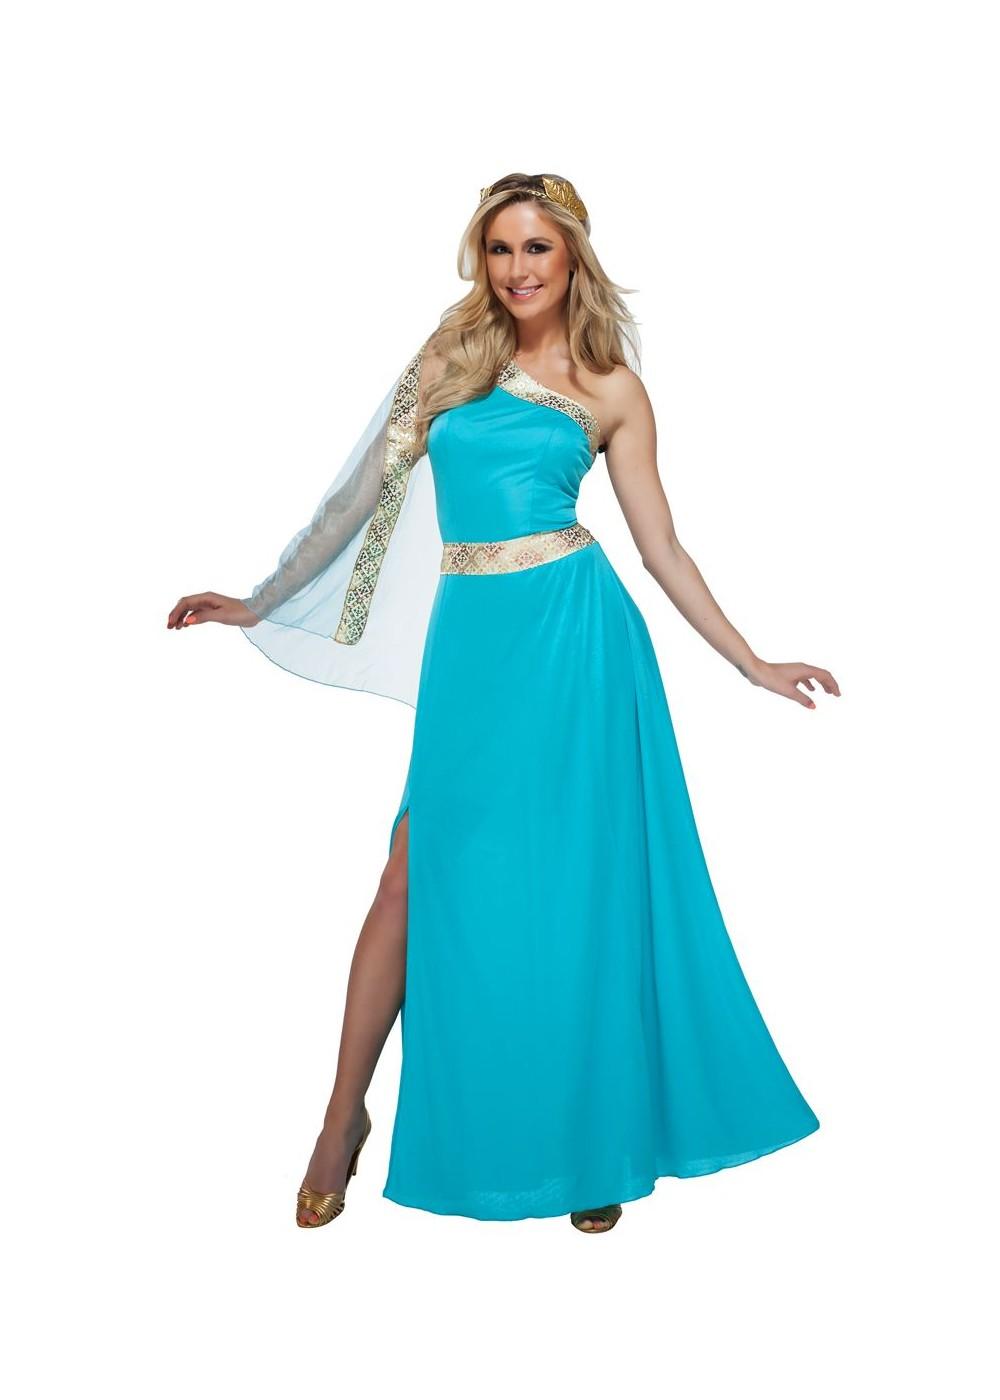 Blue Goddess Women Costume - Greek Costumes